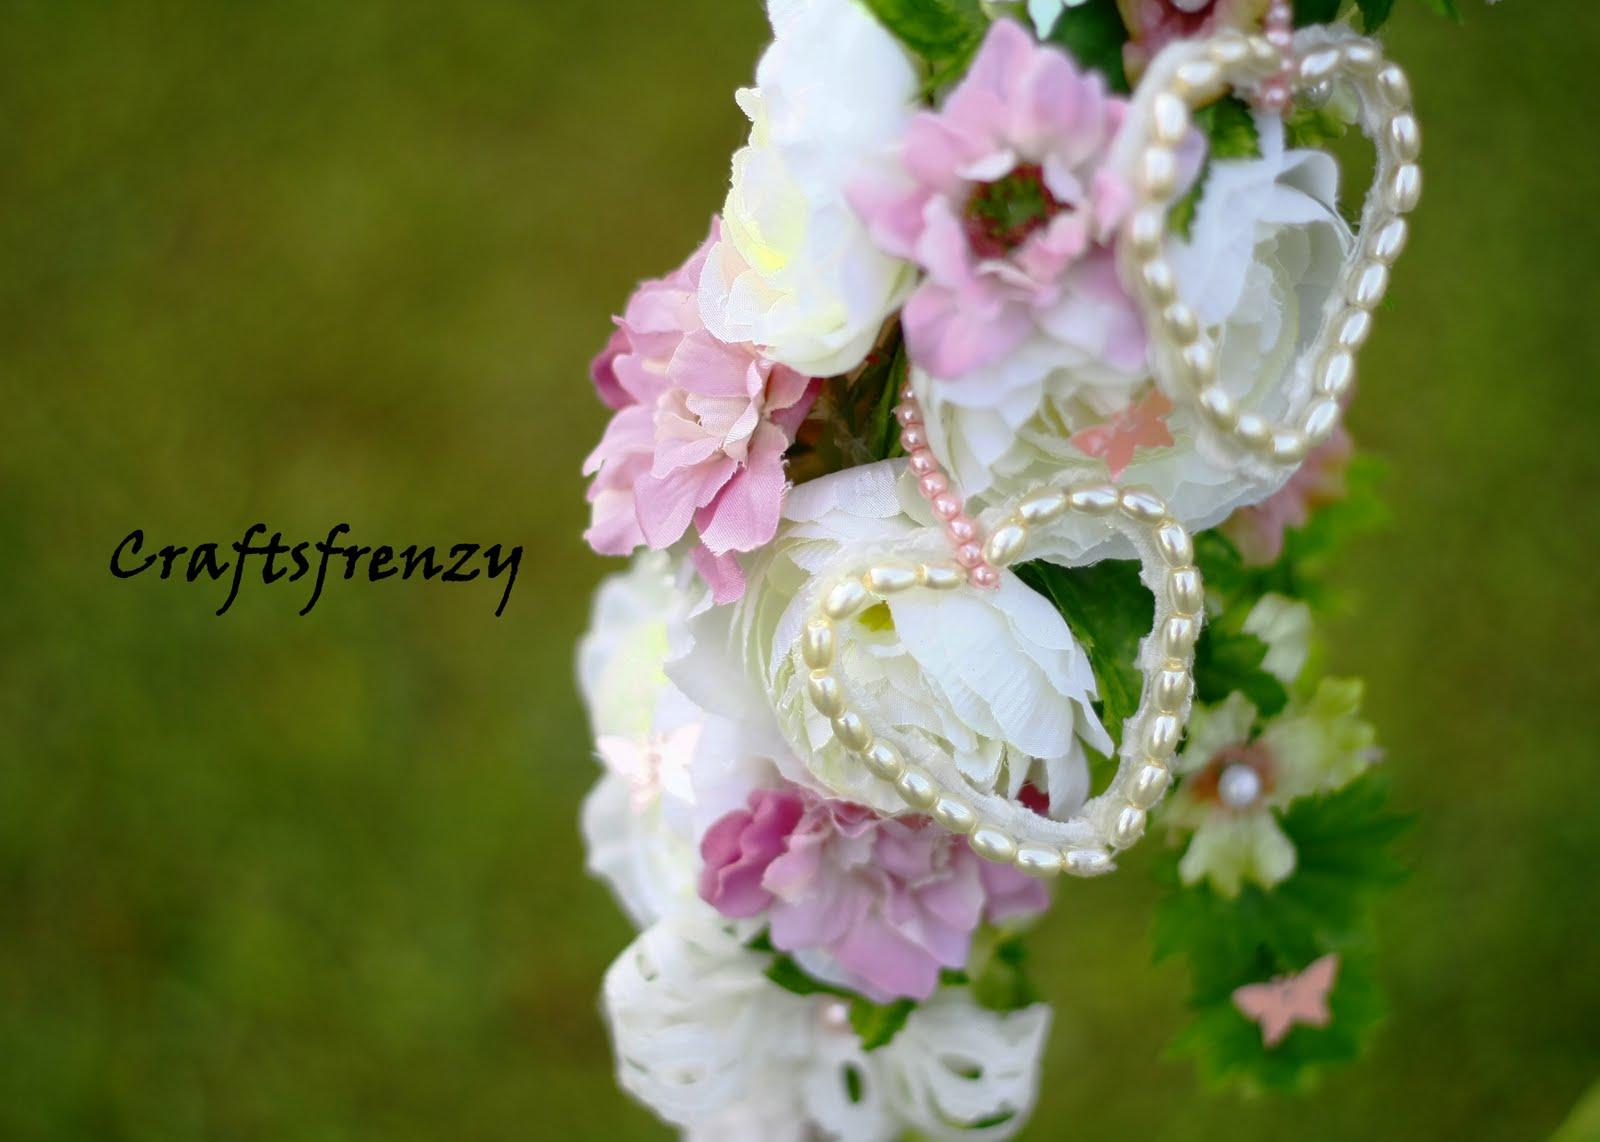 Craftsfrenzy crescent shape bridal bouquet for Crescent bouquet